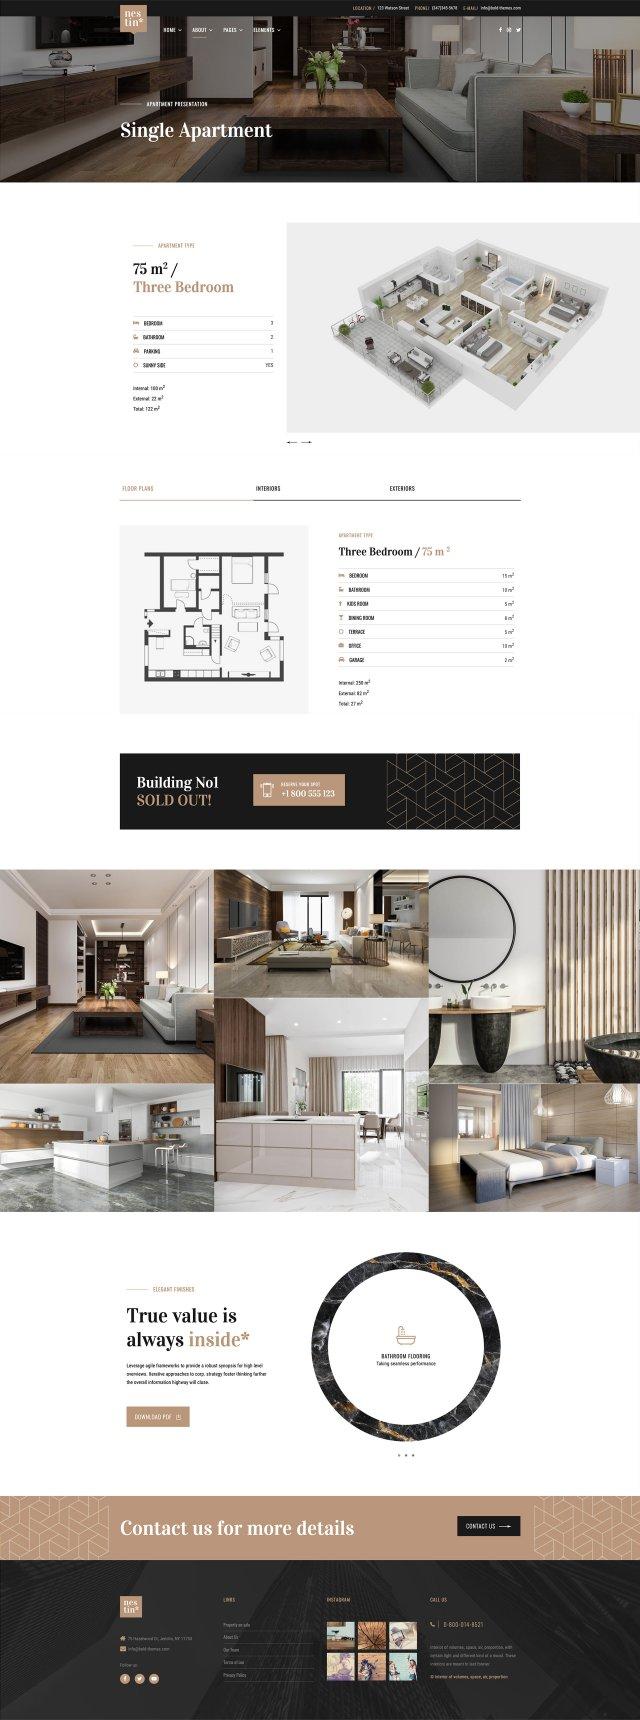 https://nestin.bold-themes.com/wp-content/uploads/2020/04/Fancy-Apartment-640x1720.jpg